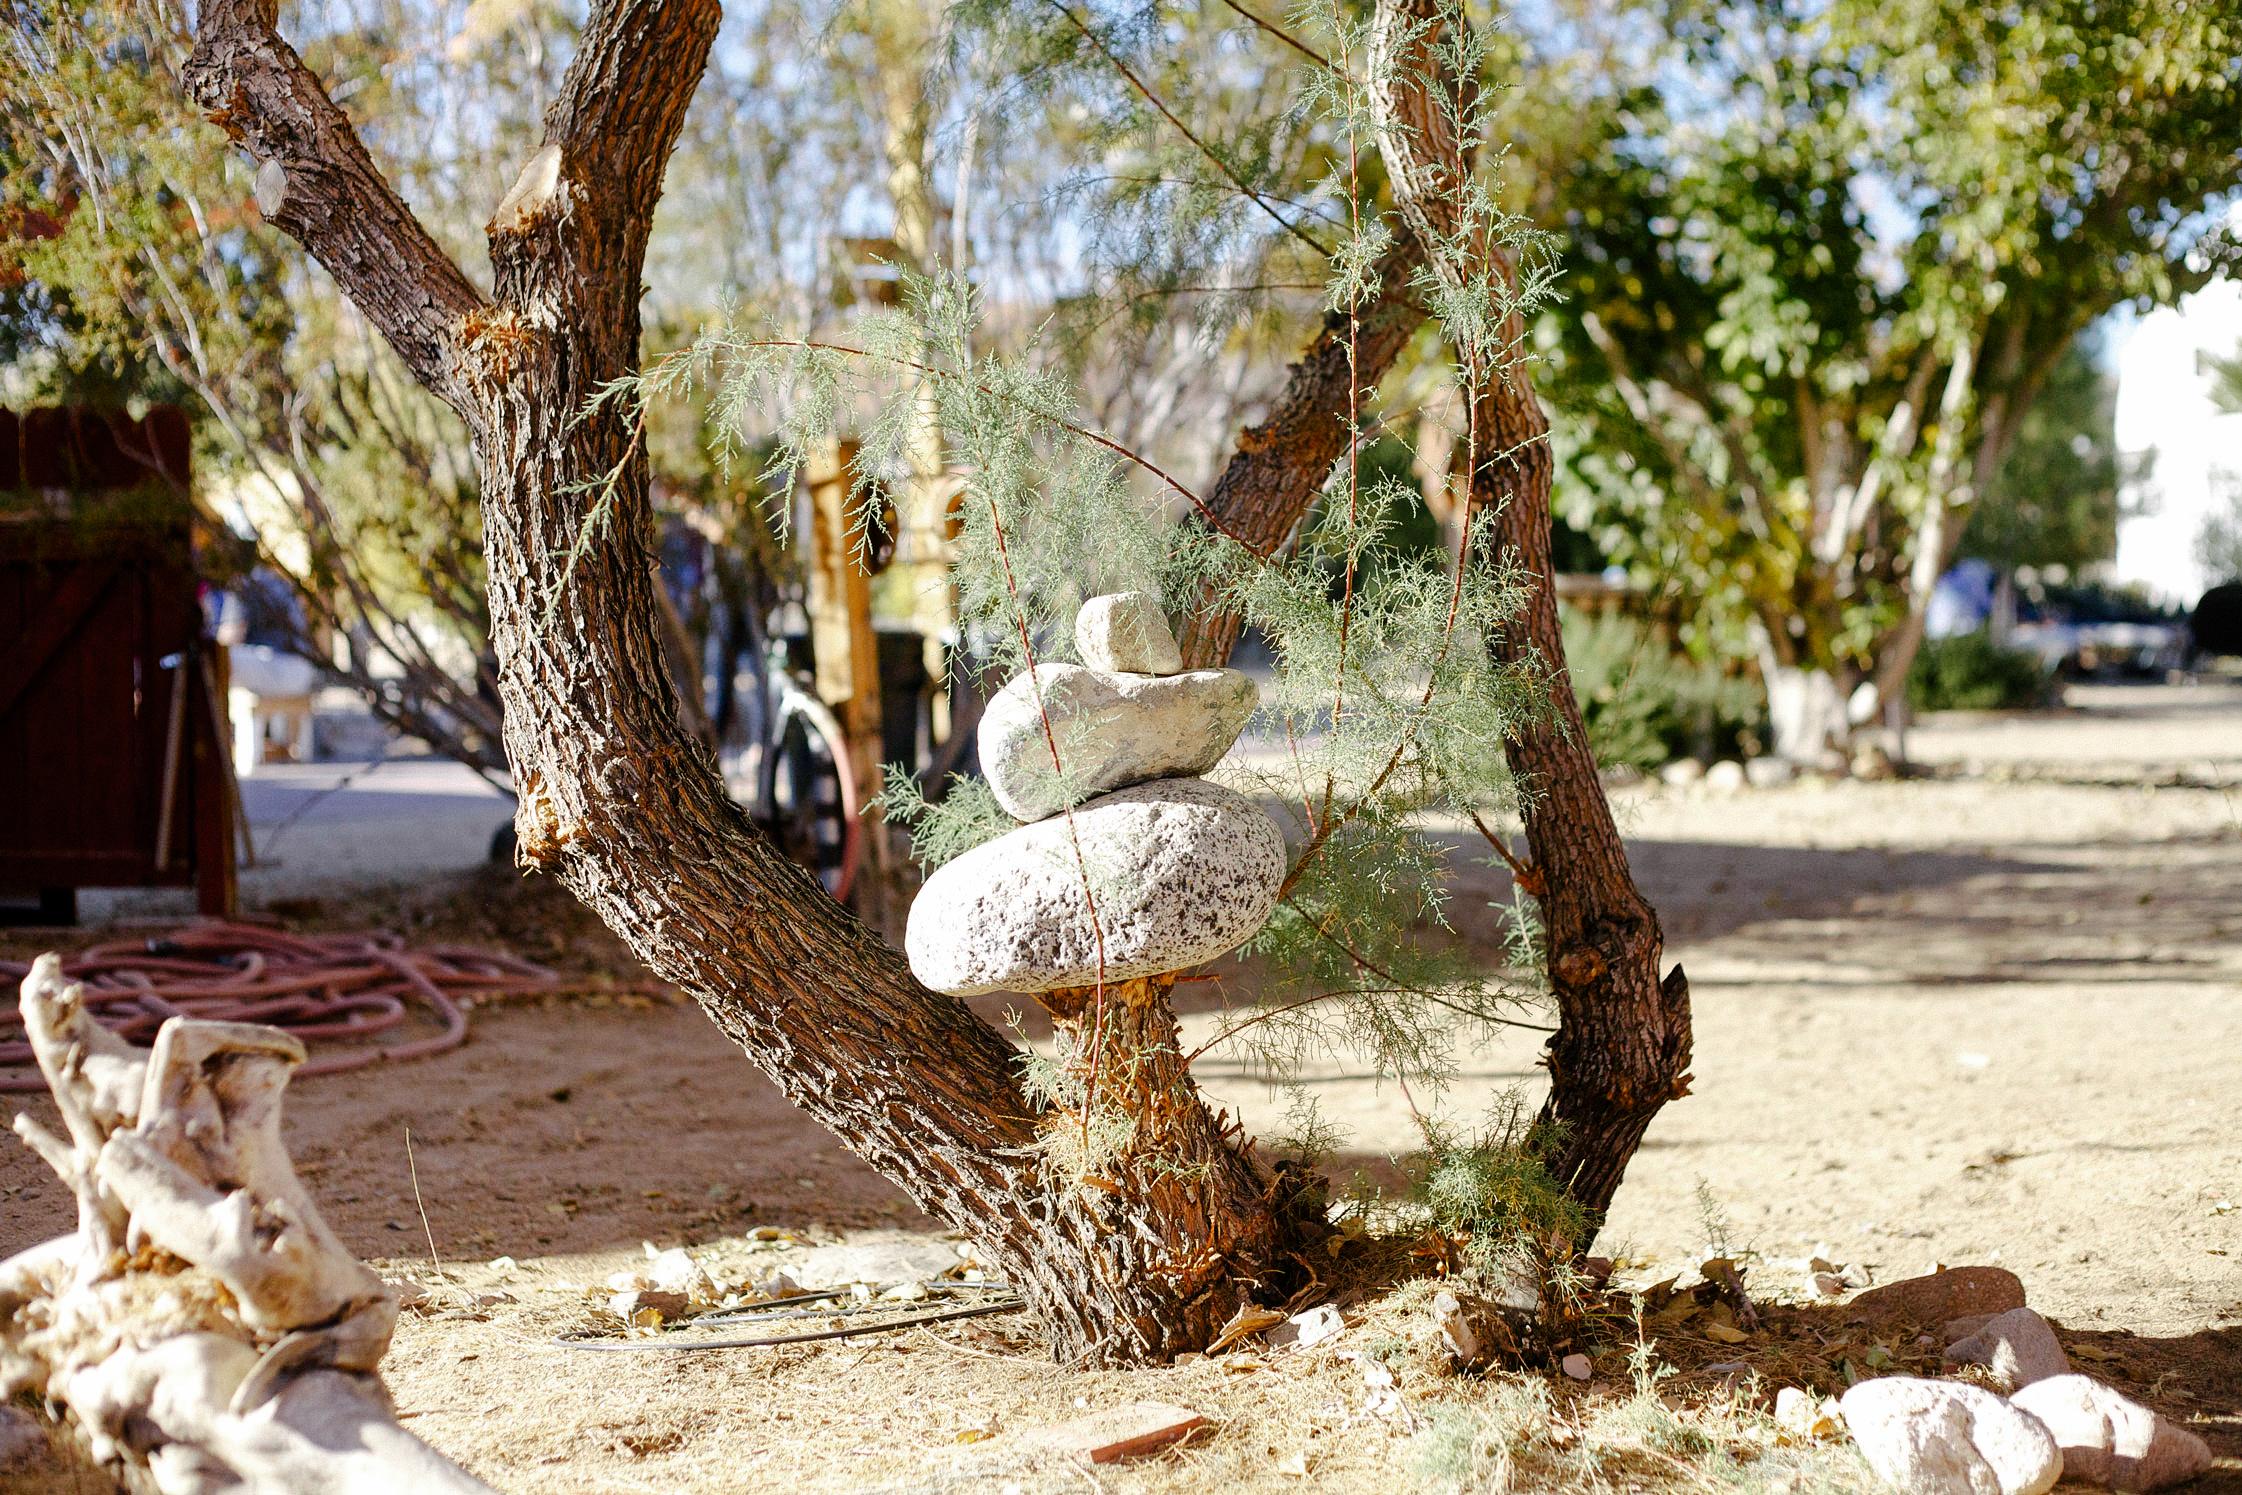 freunde von freunden joshua tree park desert trip claire. Black Bedroom Furniture Sets. Home Design Ideas